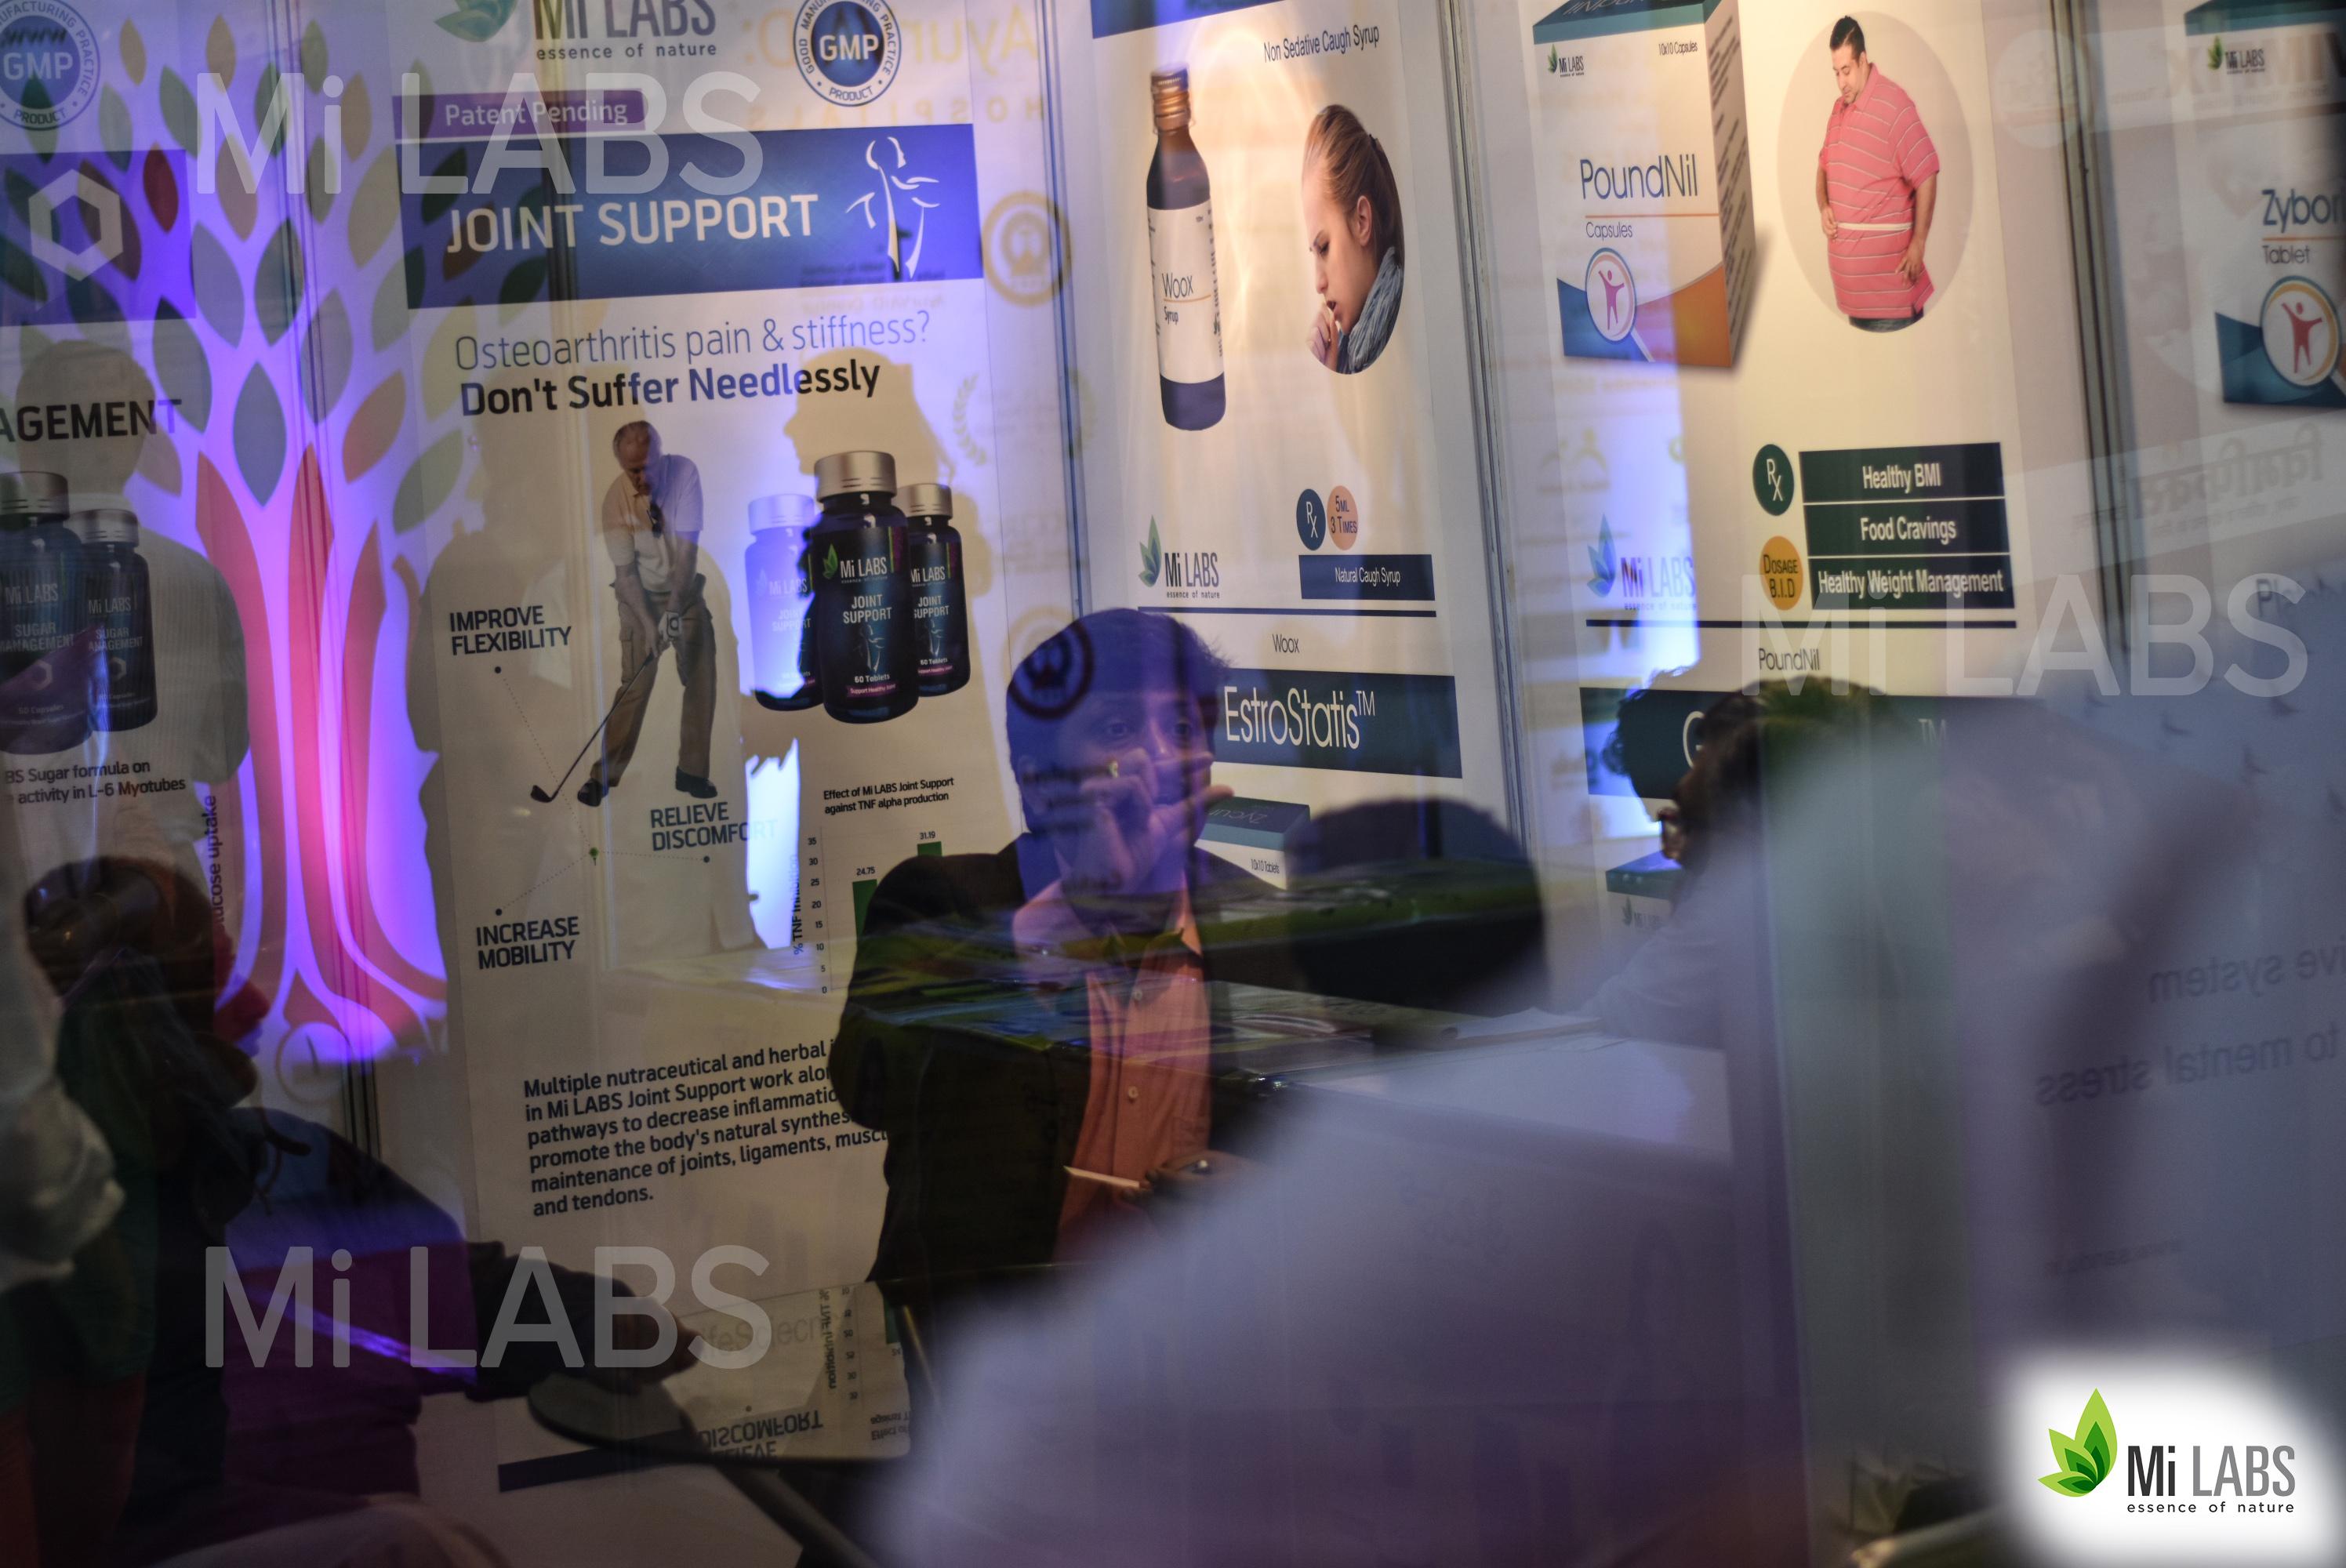 docters prescribing milabs product